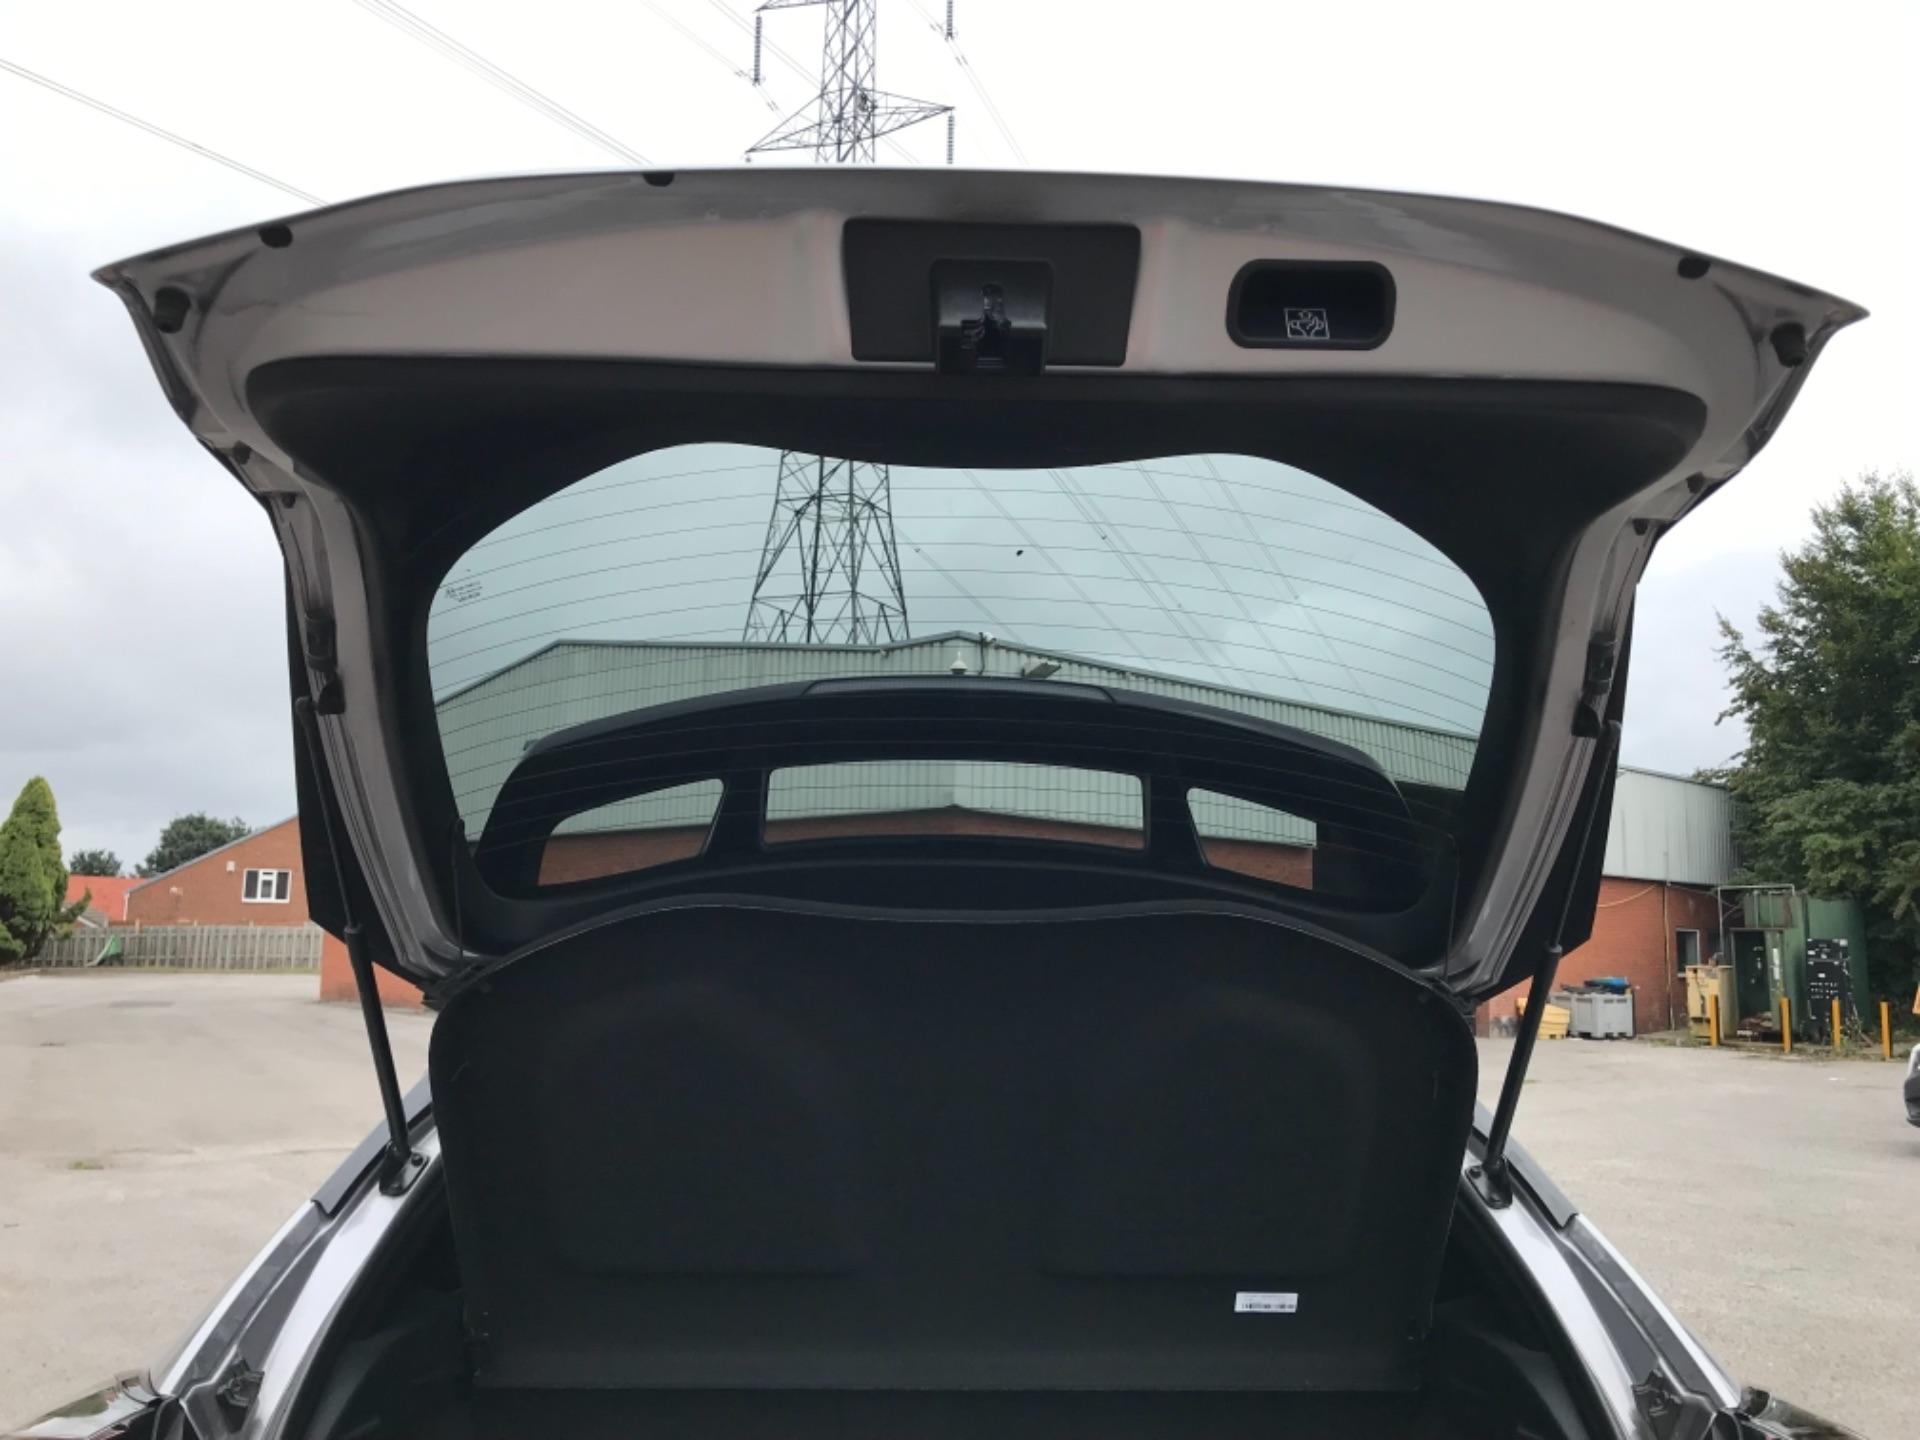 2018 Toyota C-Hr 1.8 Hybrid Dynamic 5Dr Cvt (NV18NVX) Image 53